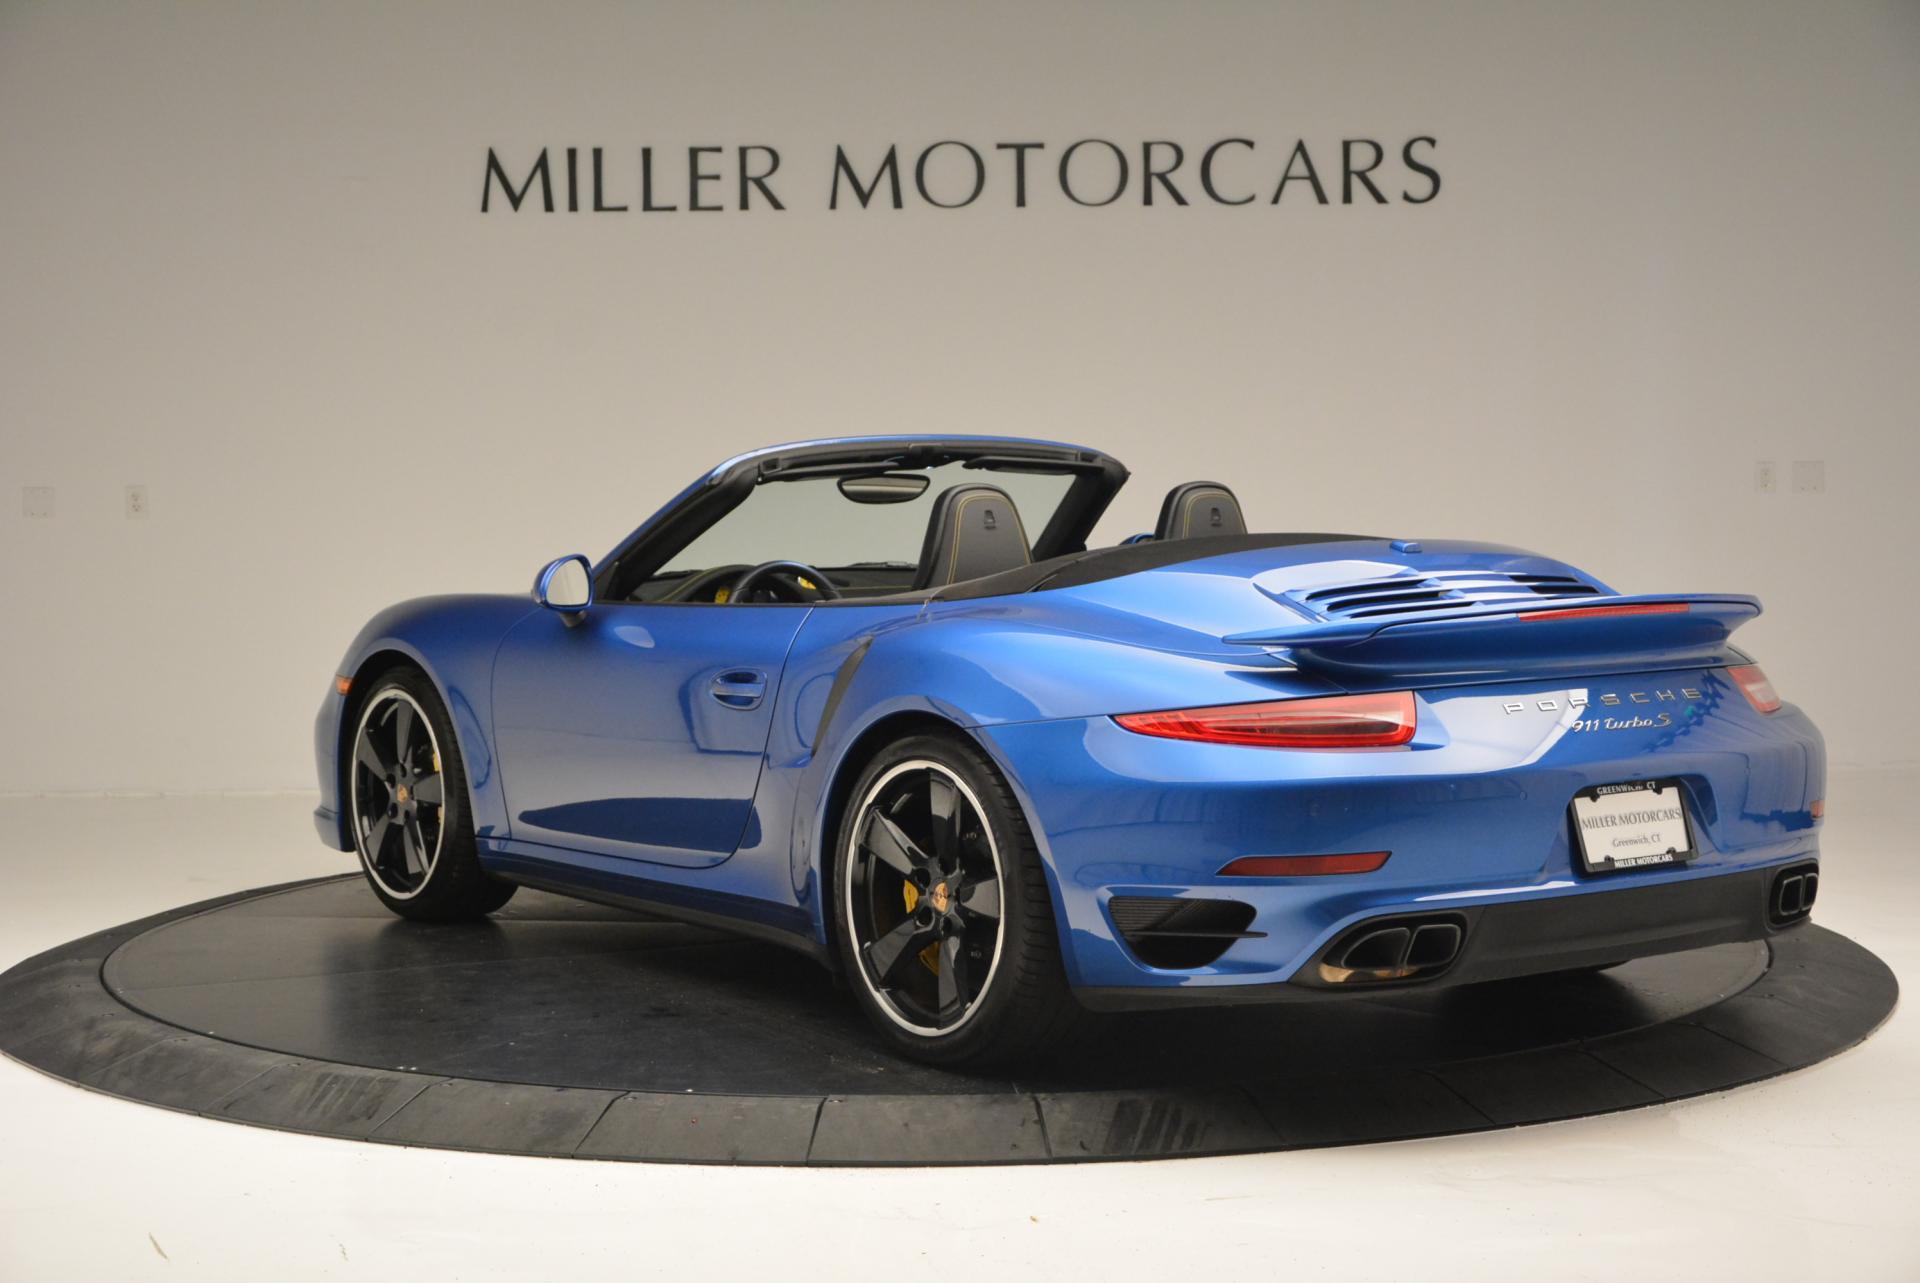 Used 2014 Porsche 911 Turbo S For Sale In Greenwich, CT 105_p5